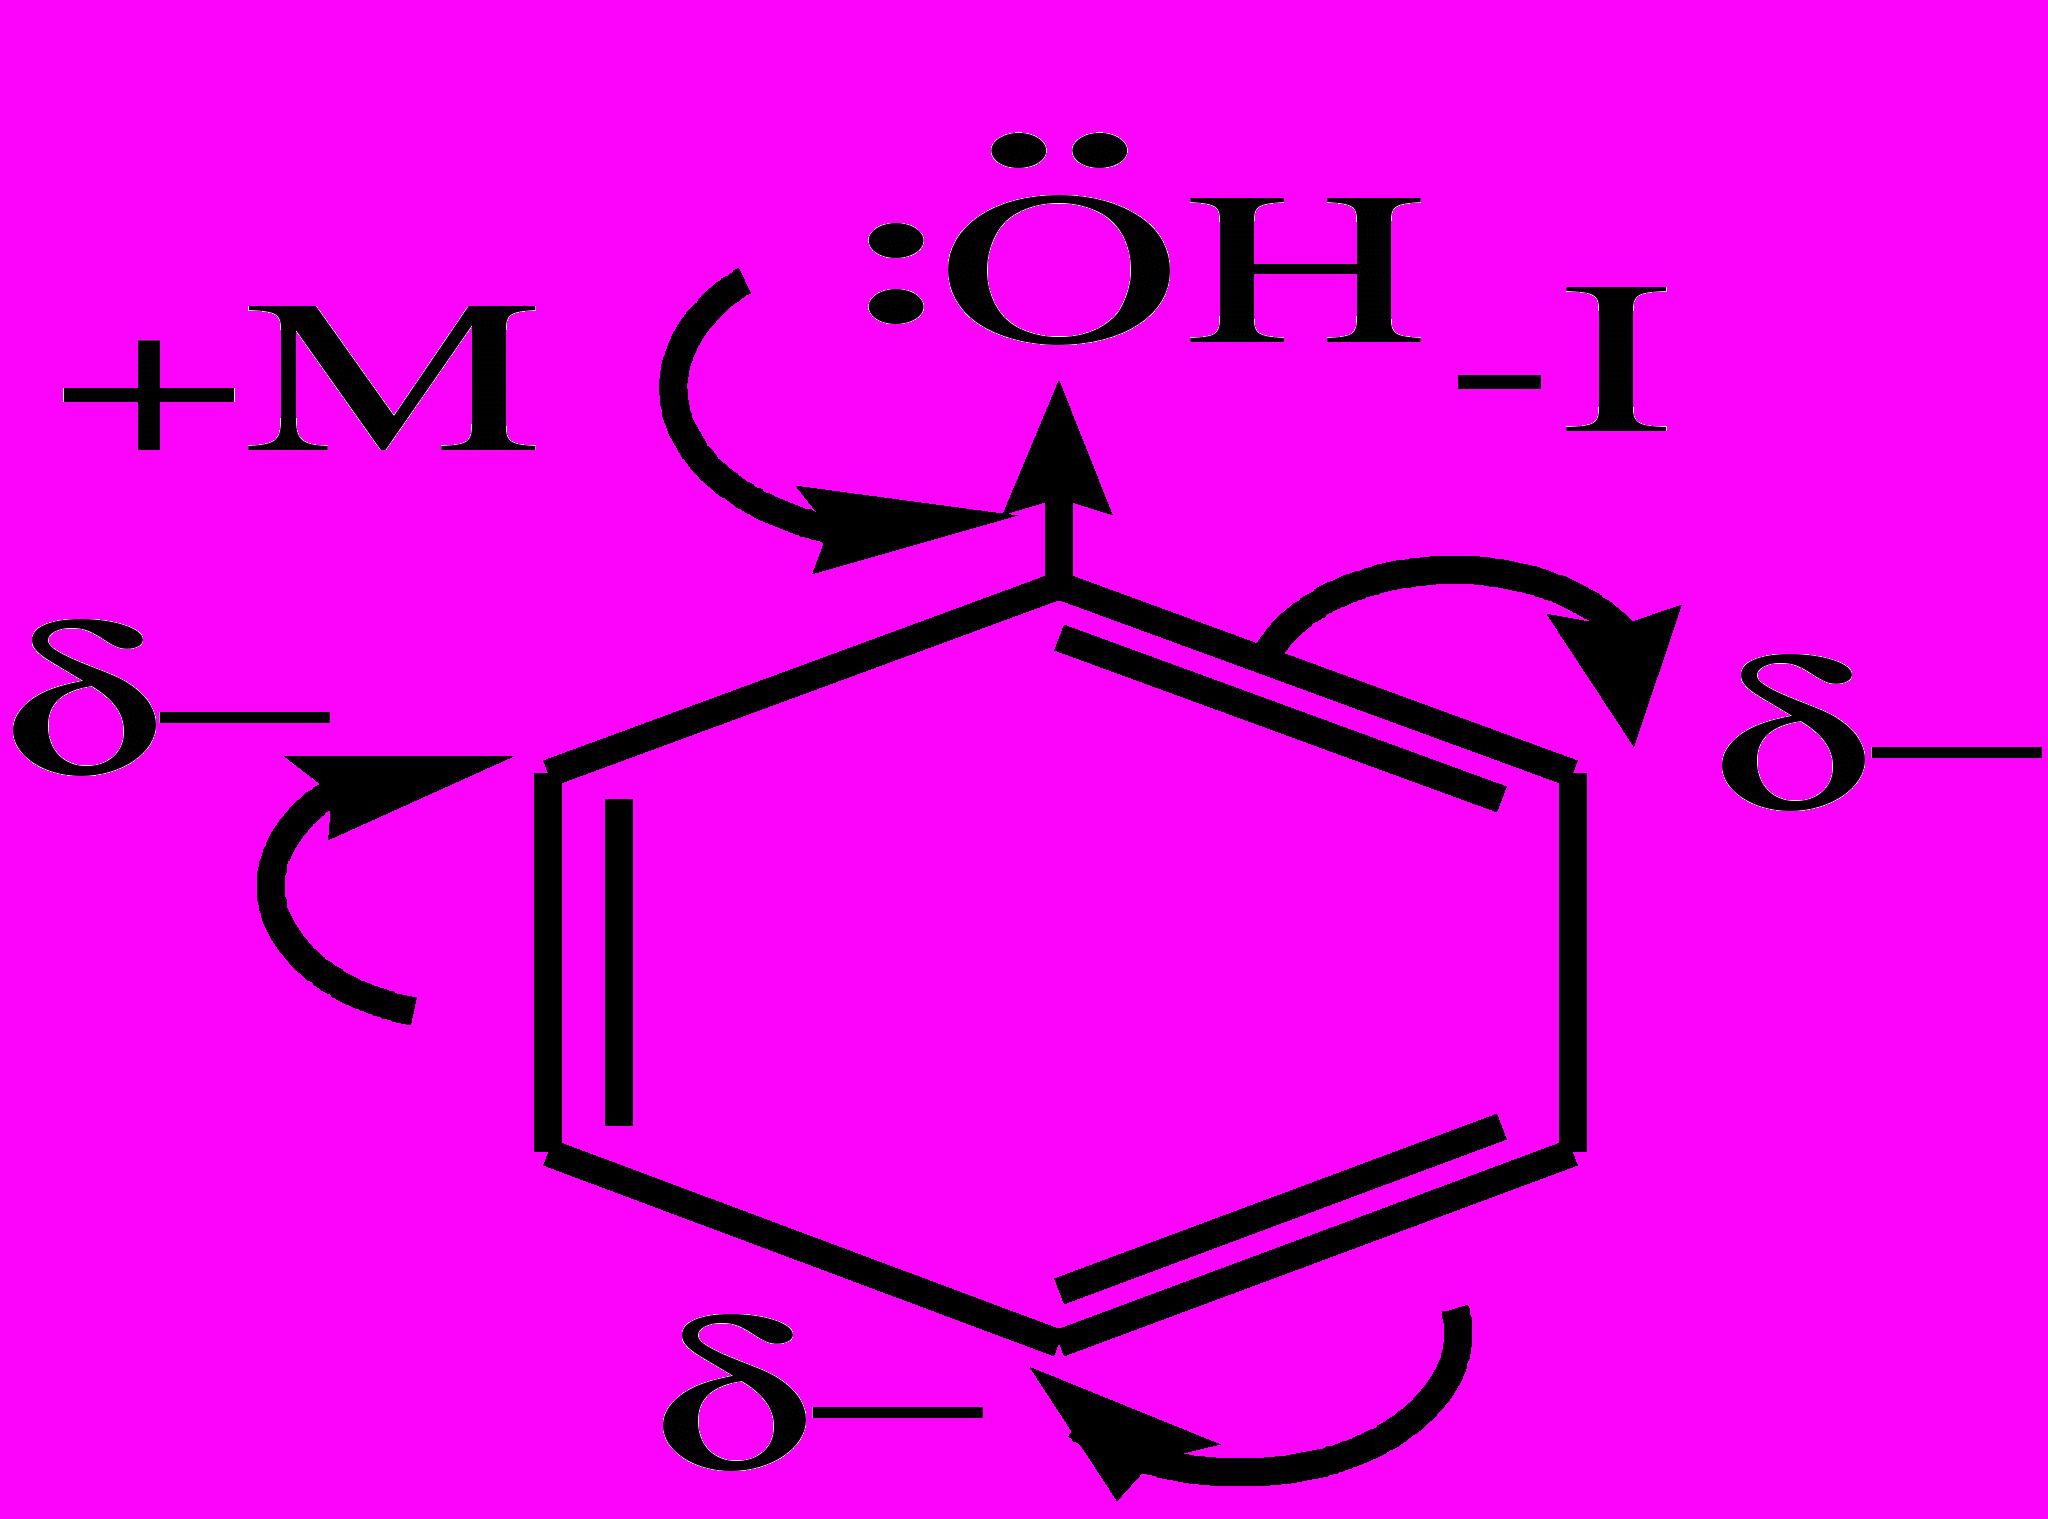 электронная формула фенола картинка как журнал